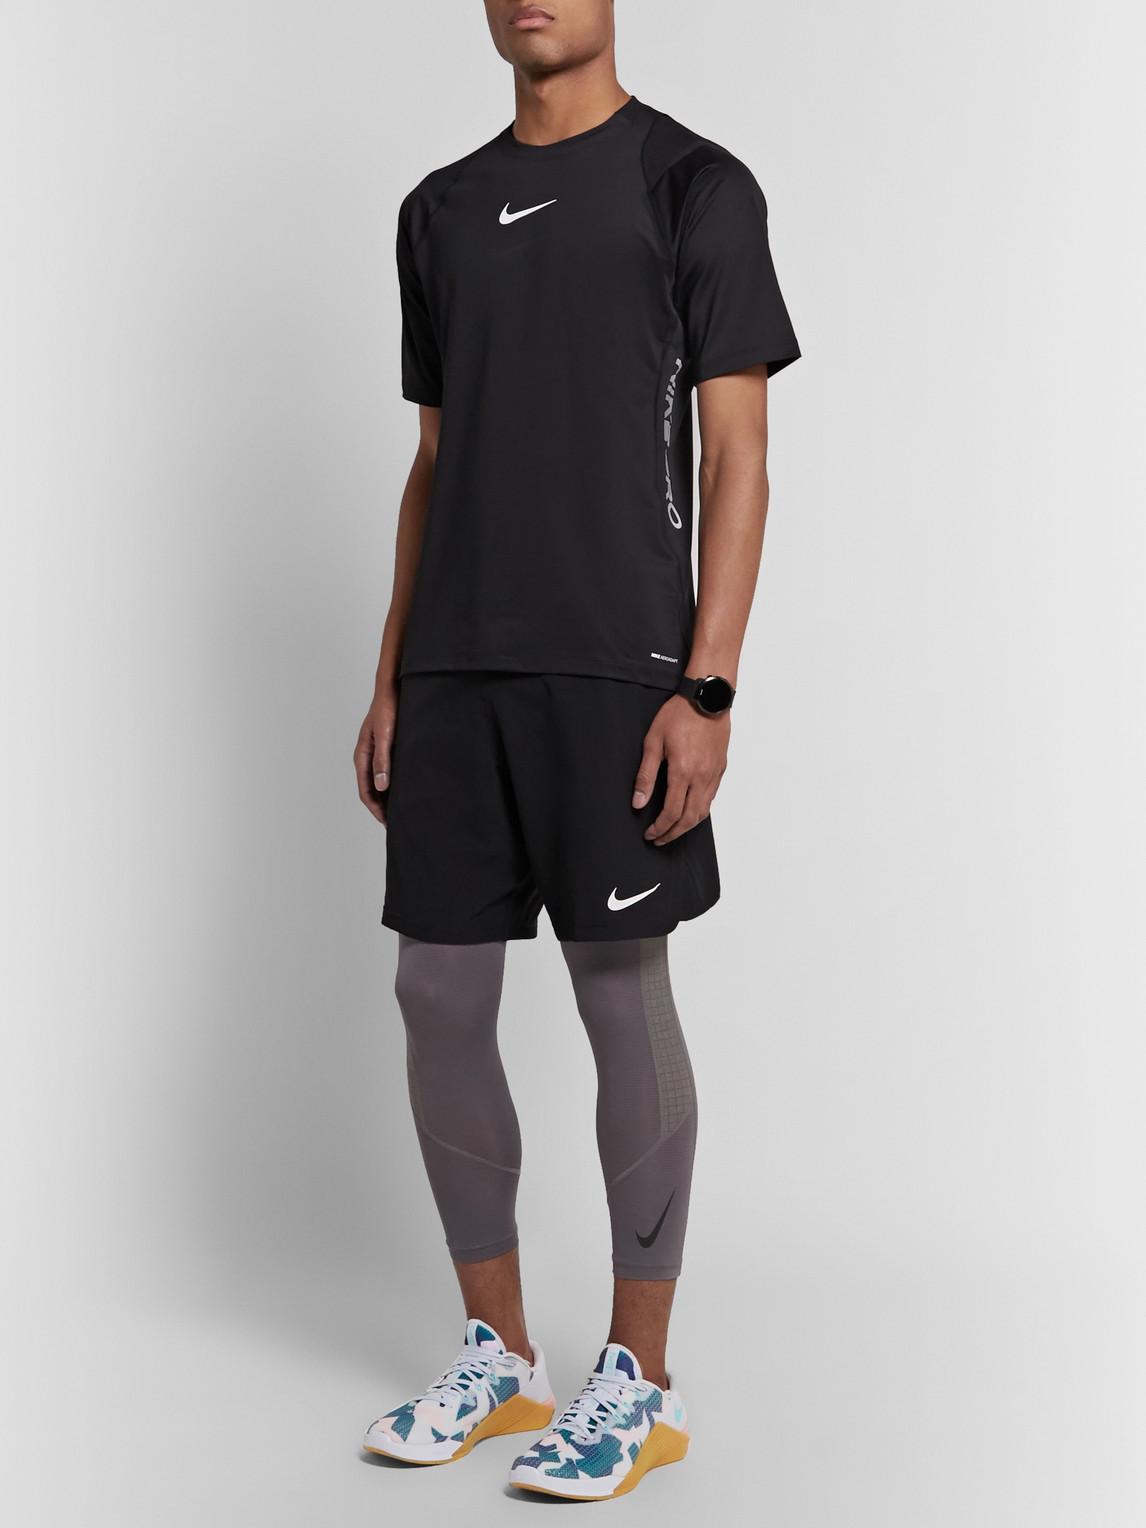 Nike Sneakers METCON 5 RUBBER-TRIMMED MESH SNEAKERS